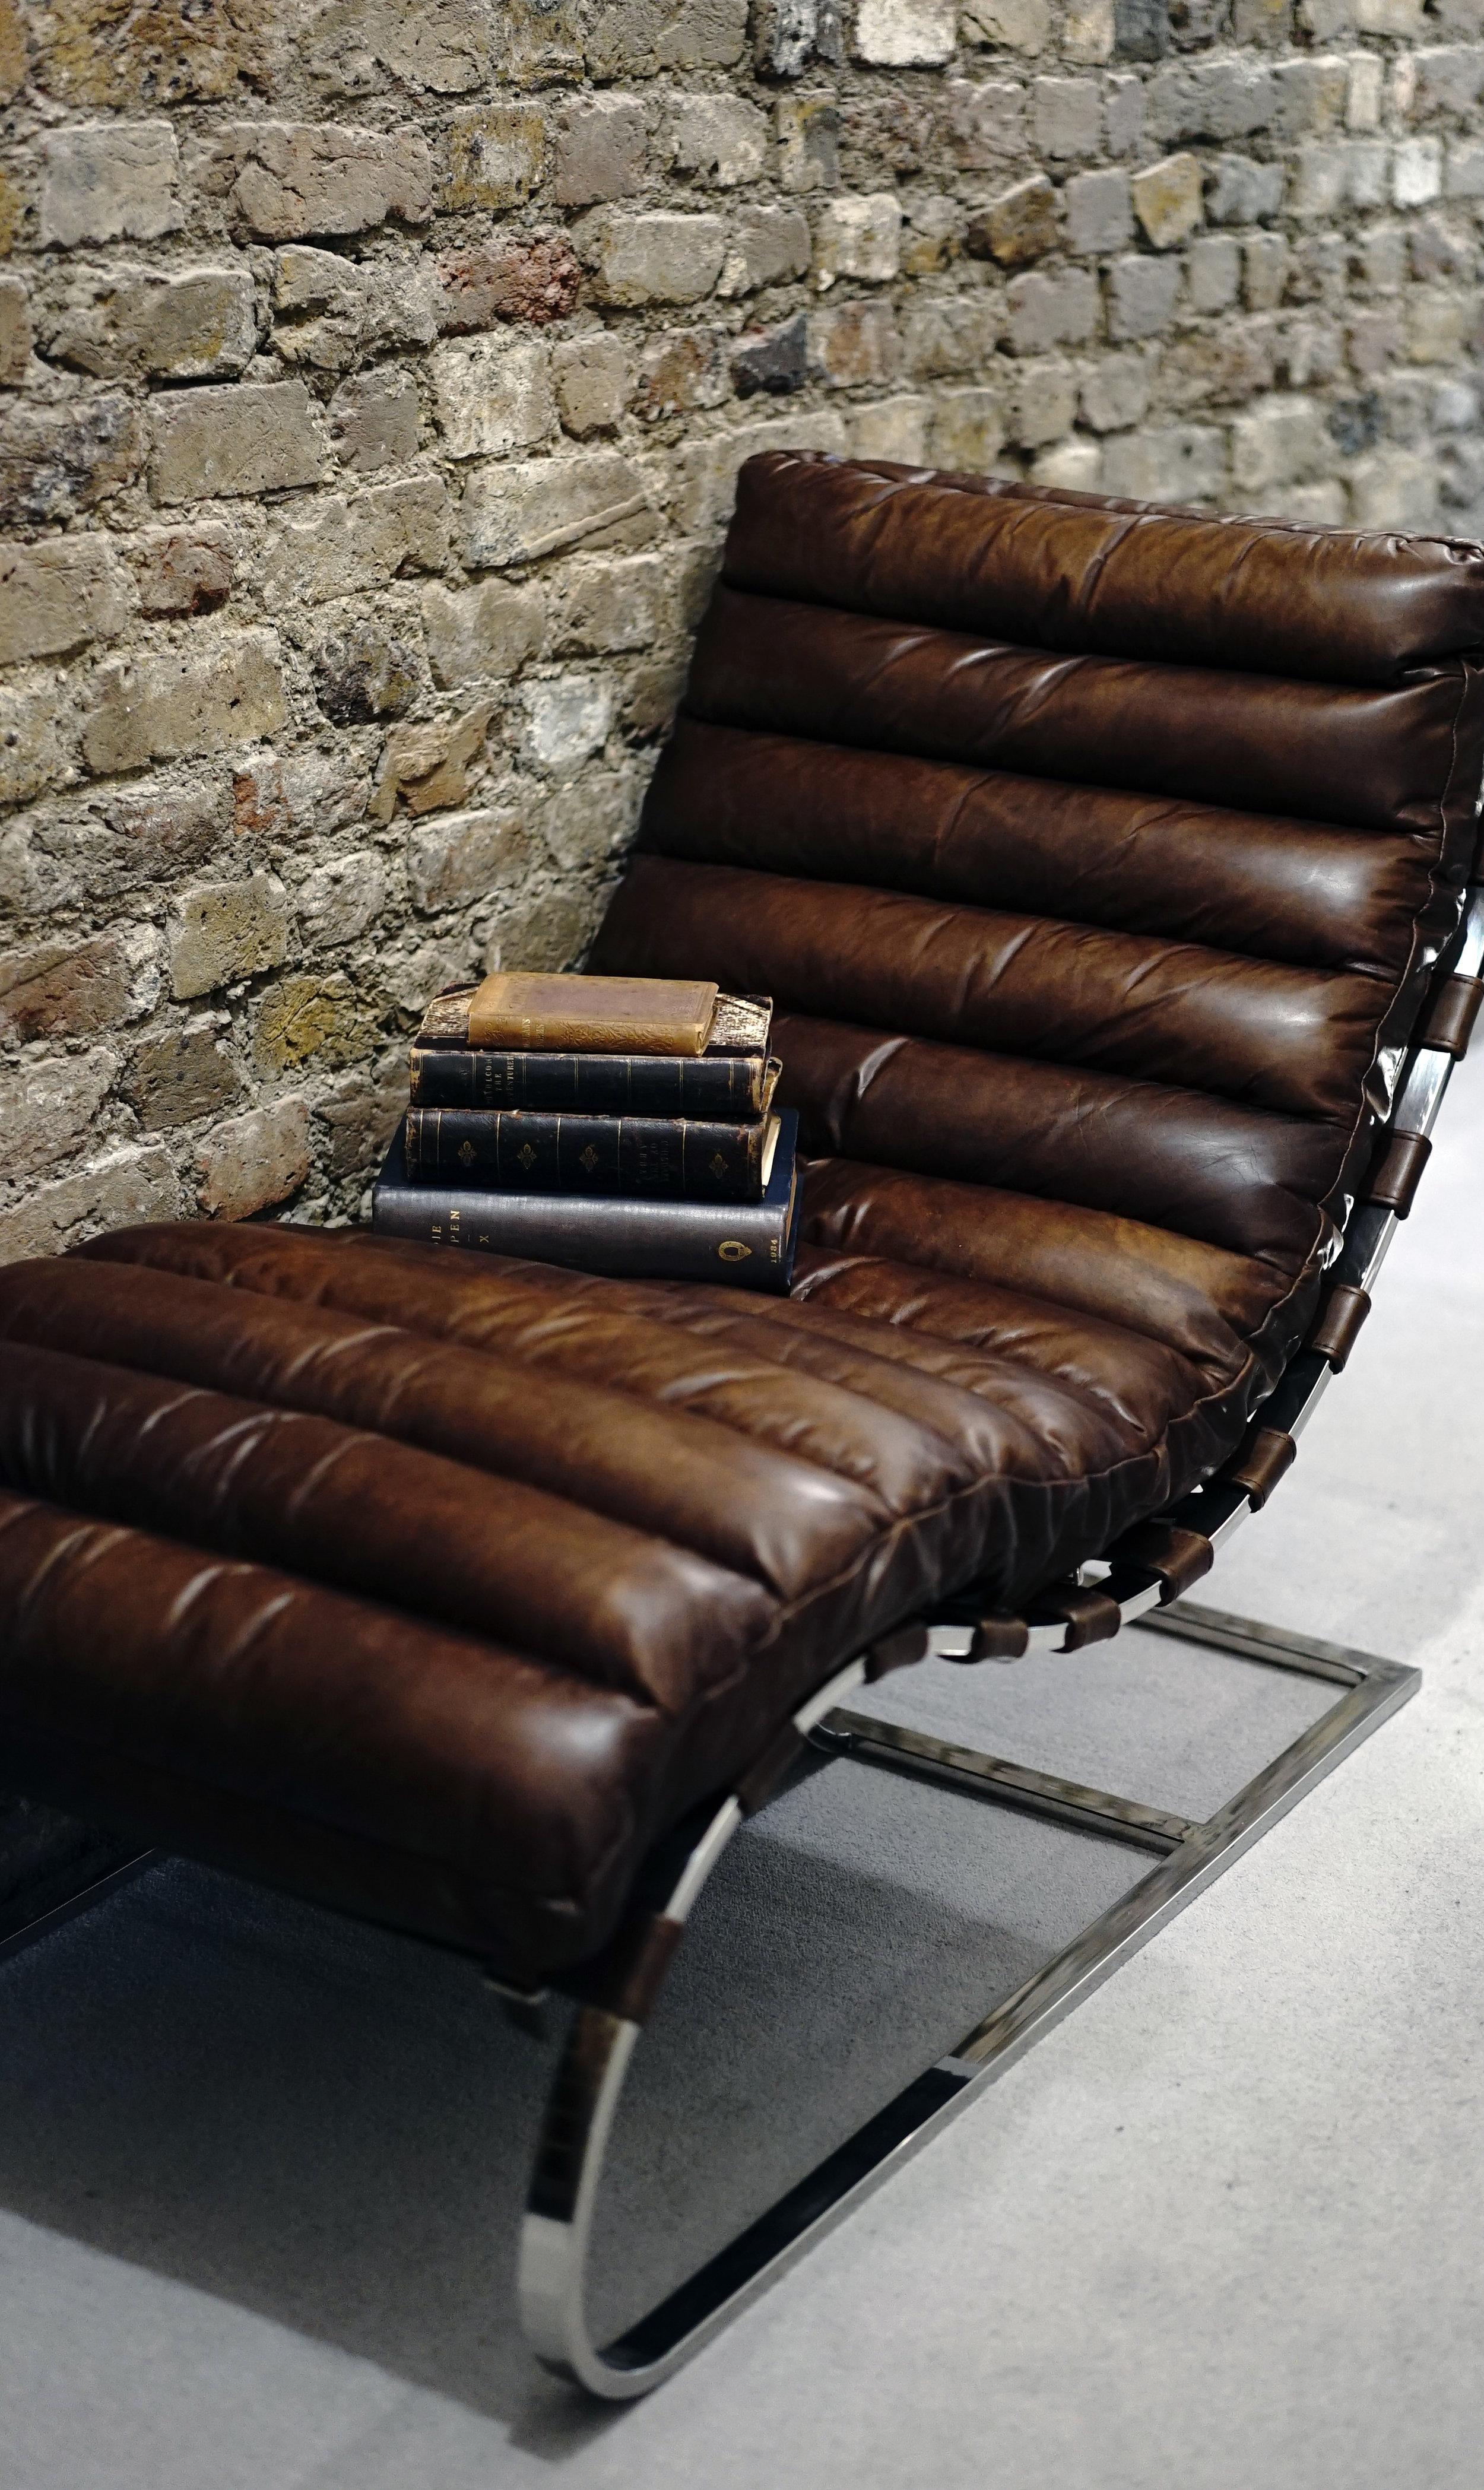 Chair and Books.jpg